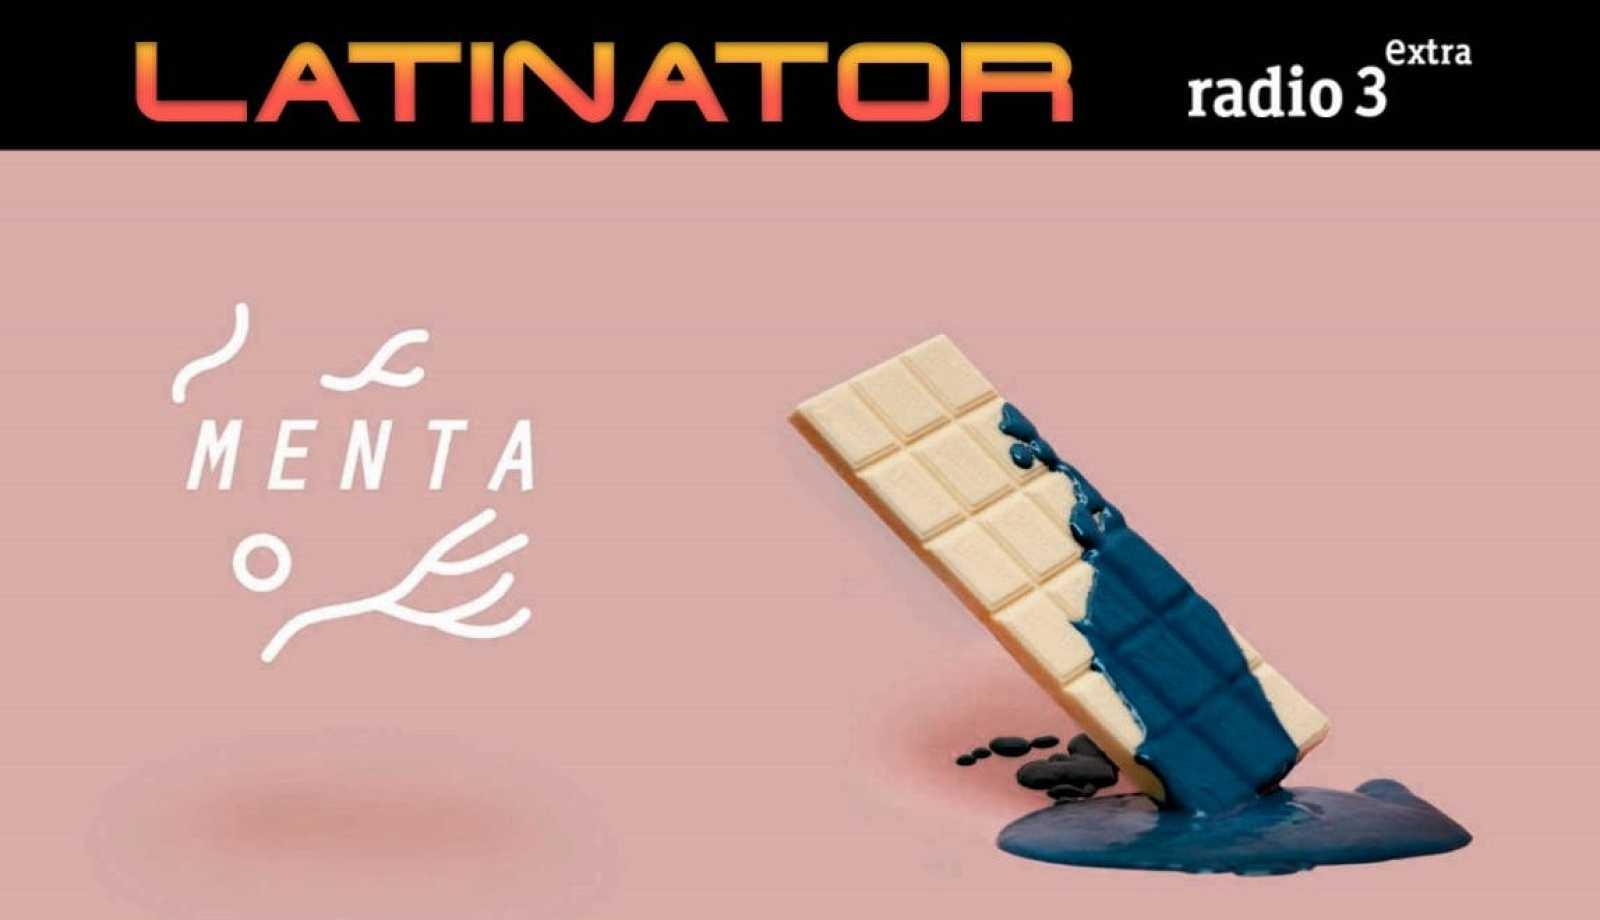 Latinator - MENTA - Escuchar ahora